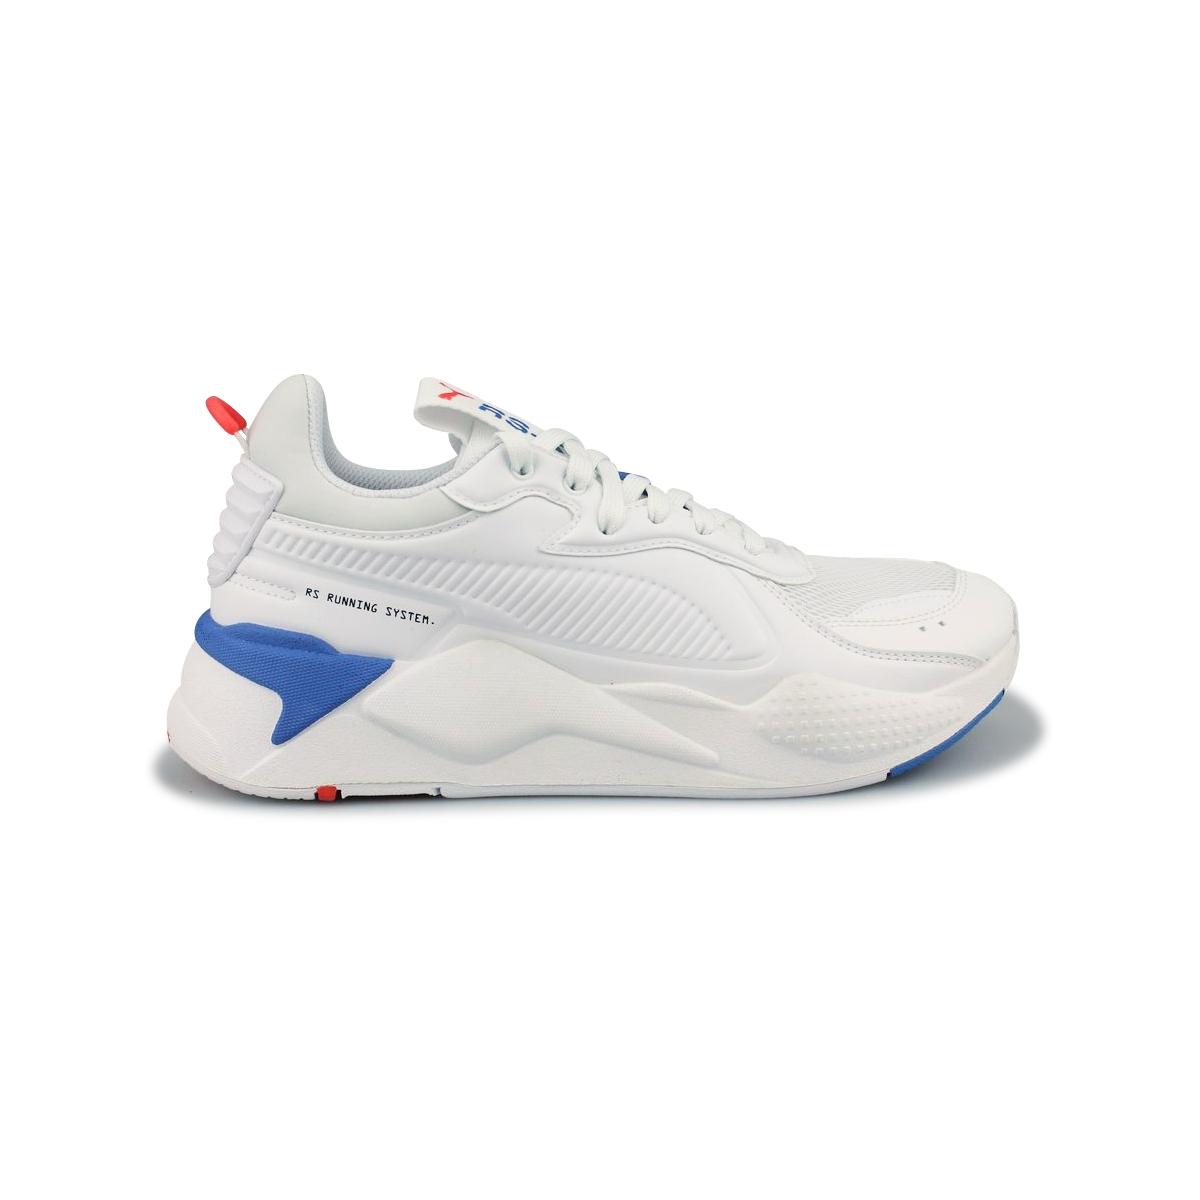 oShooz : Baskets de sport Adidas Stan Smith, Converse